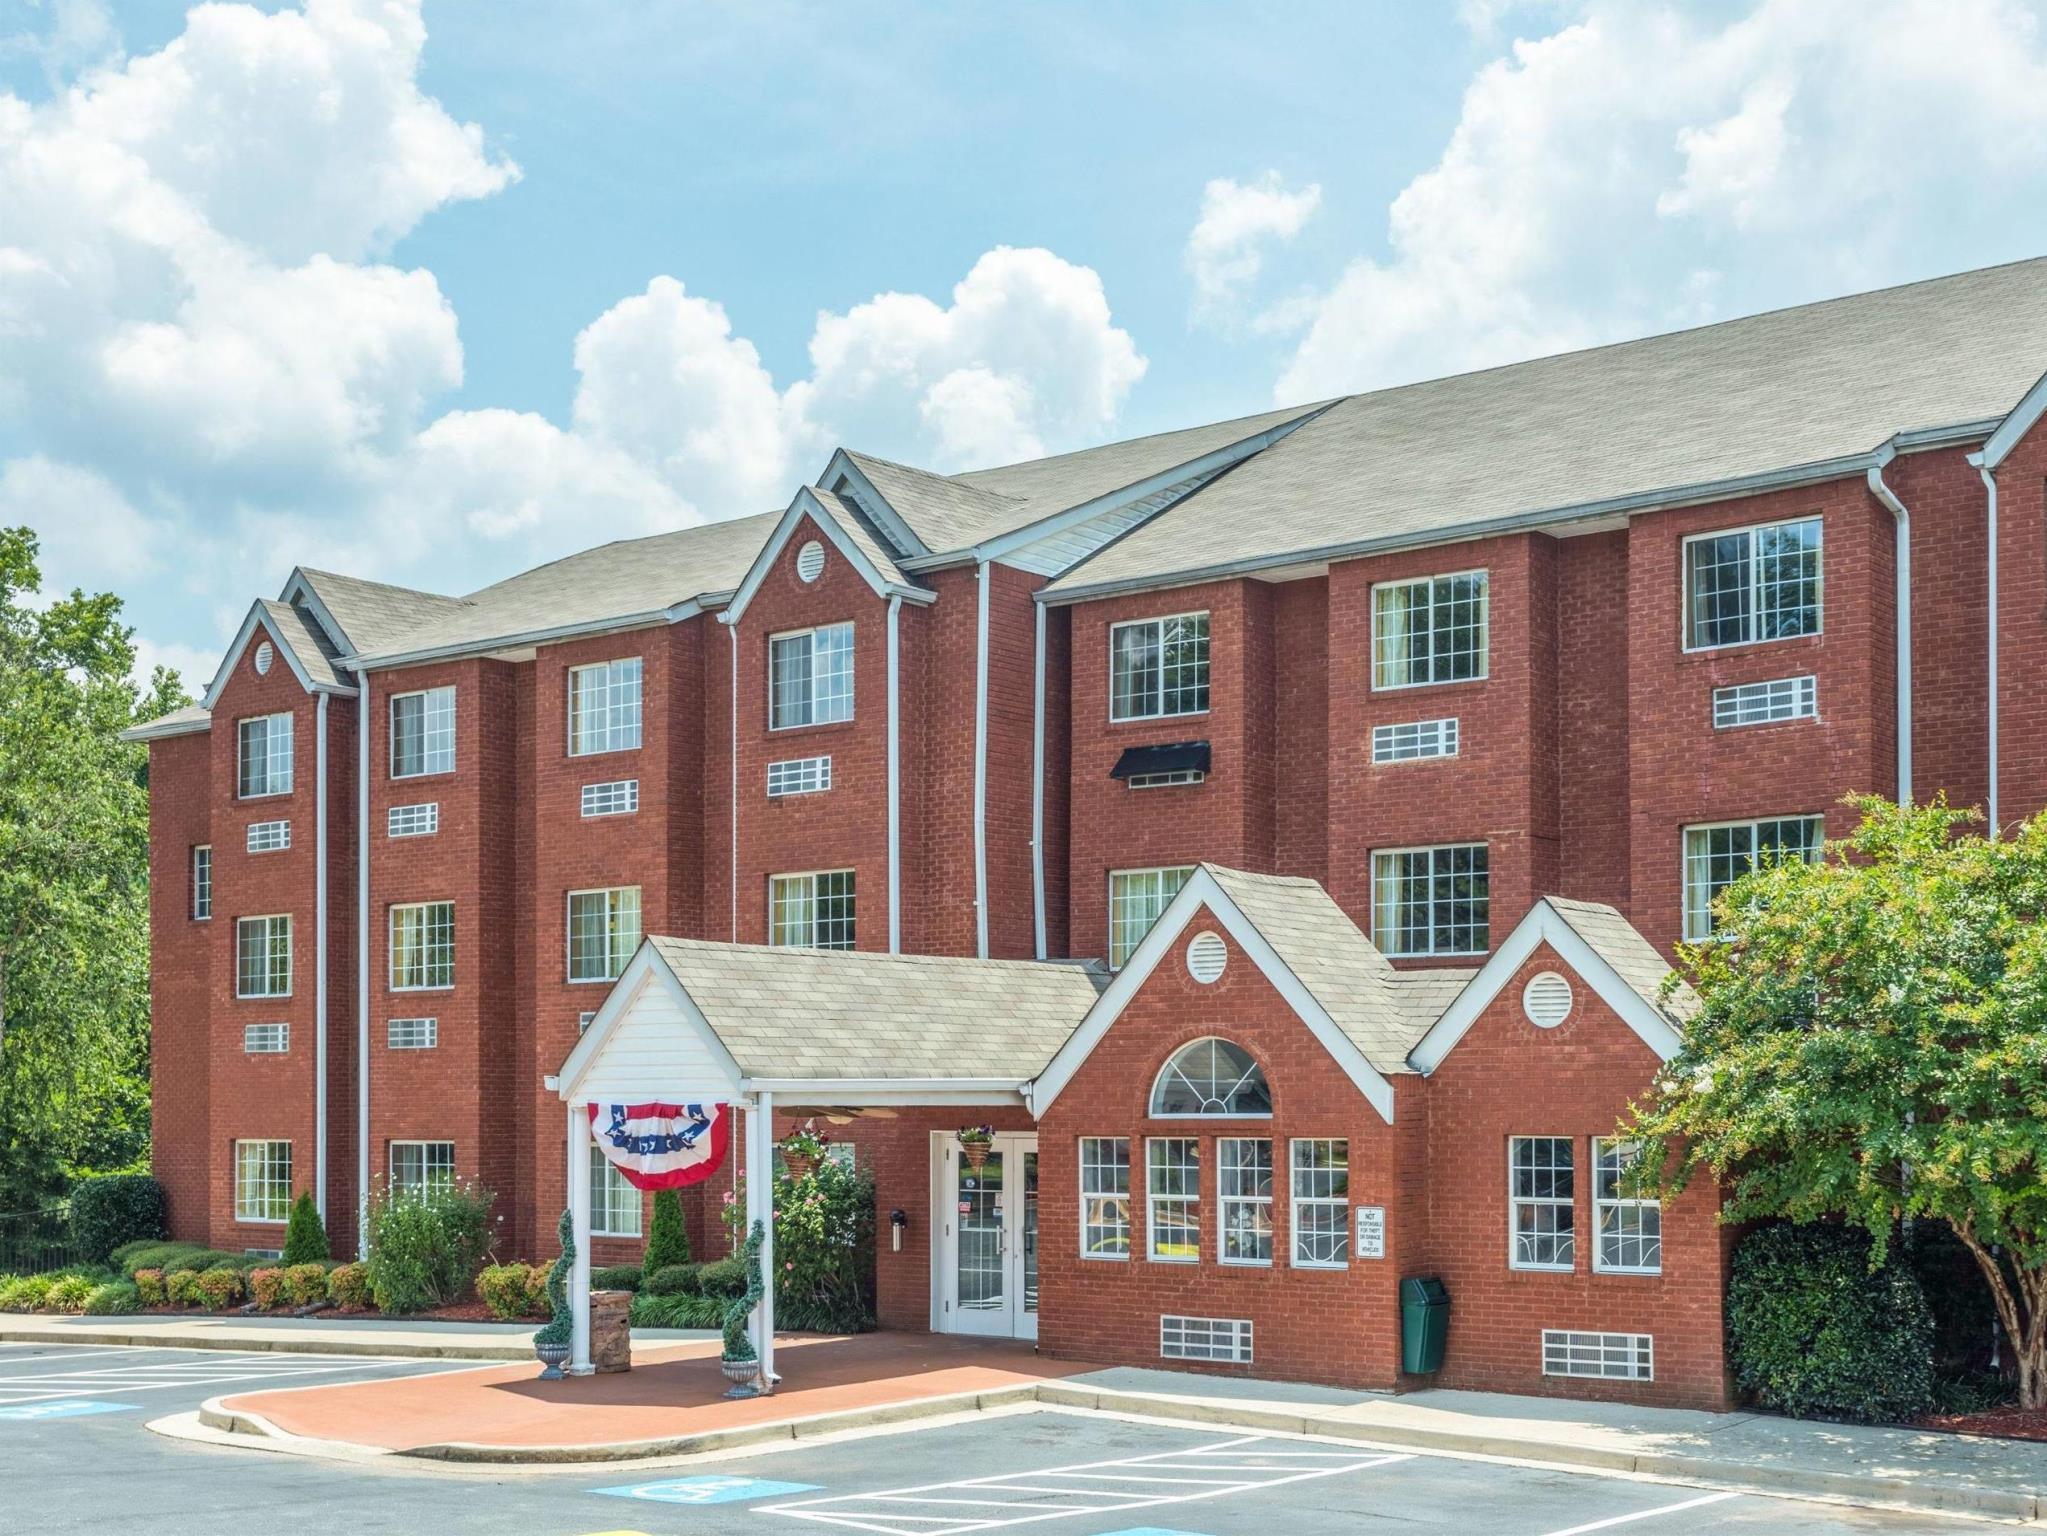 Microtel Inn And Suites By Wyndham Stockbridge Atlanta I 75